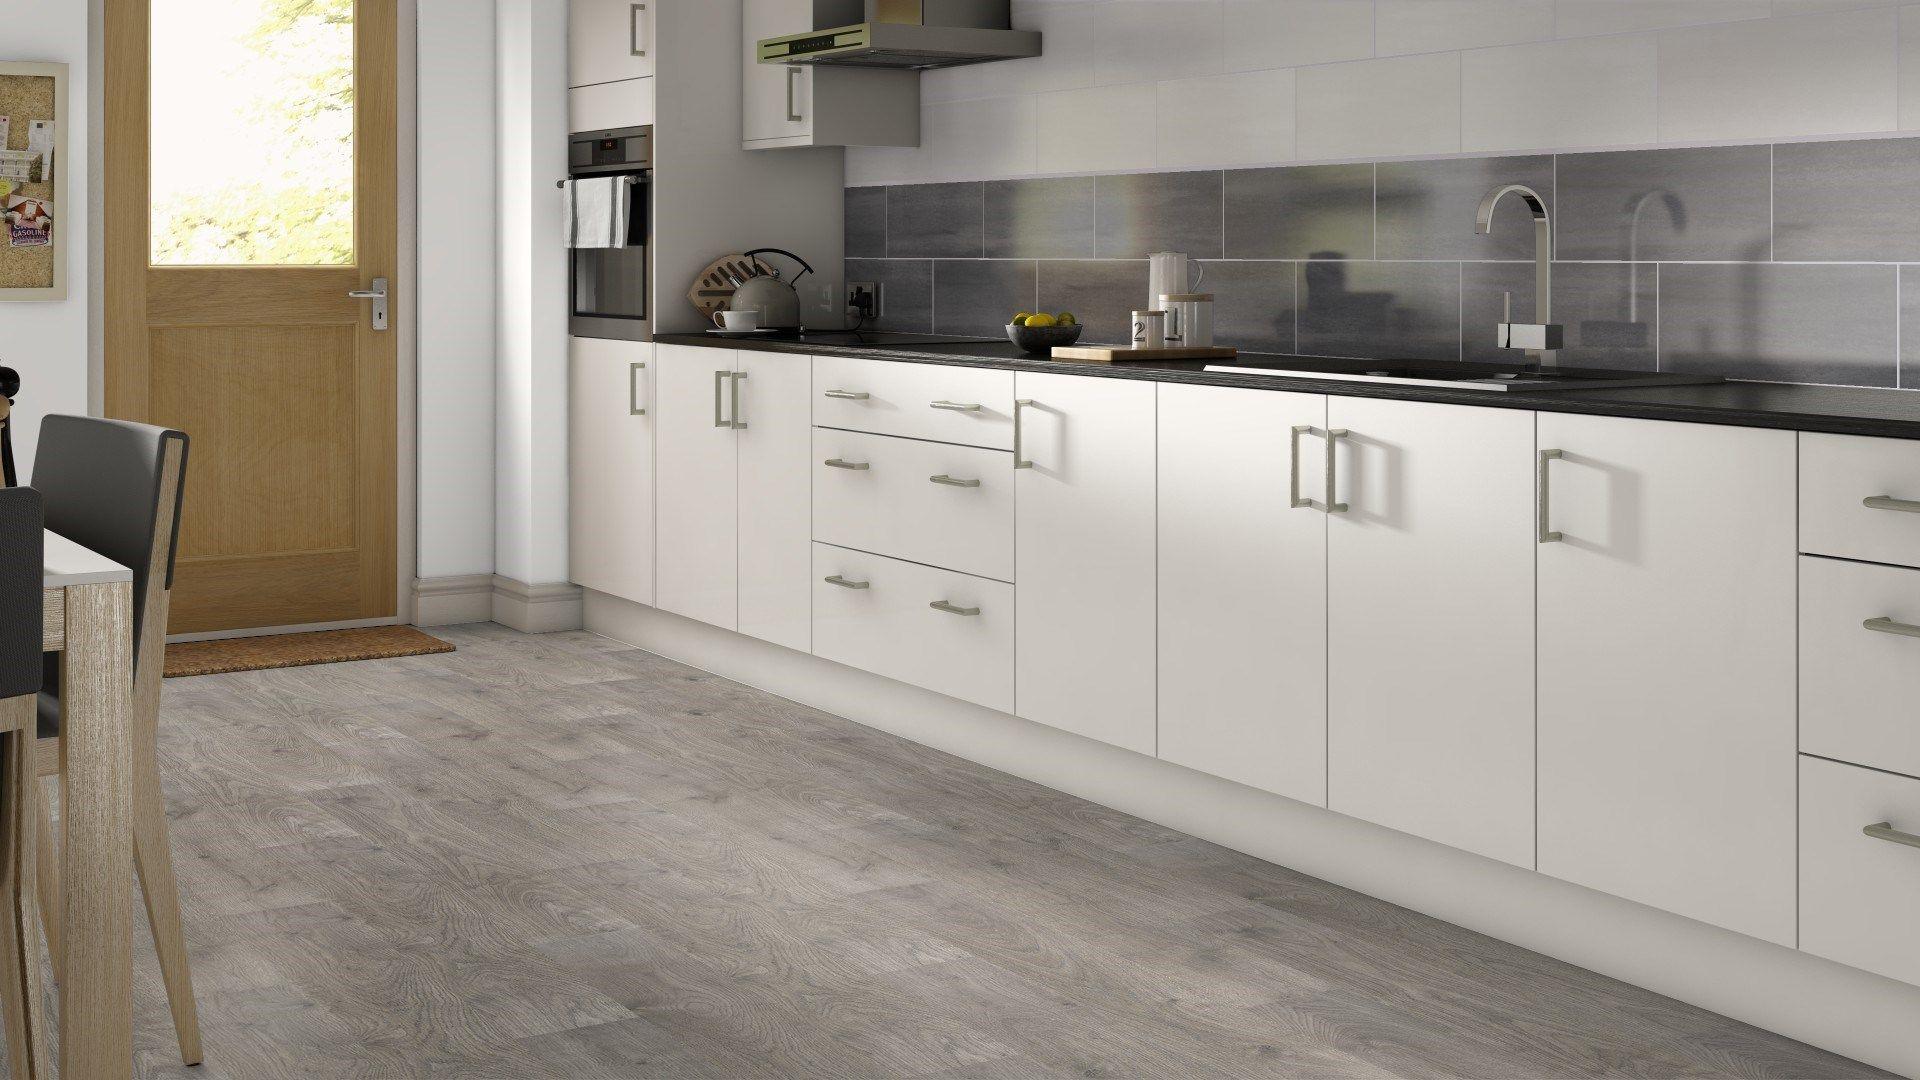 San diego oak laminate floor with essence black grey wall san diego oak laminate floor with essence black grey wall dailygadgetfo Gallery